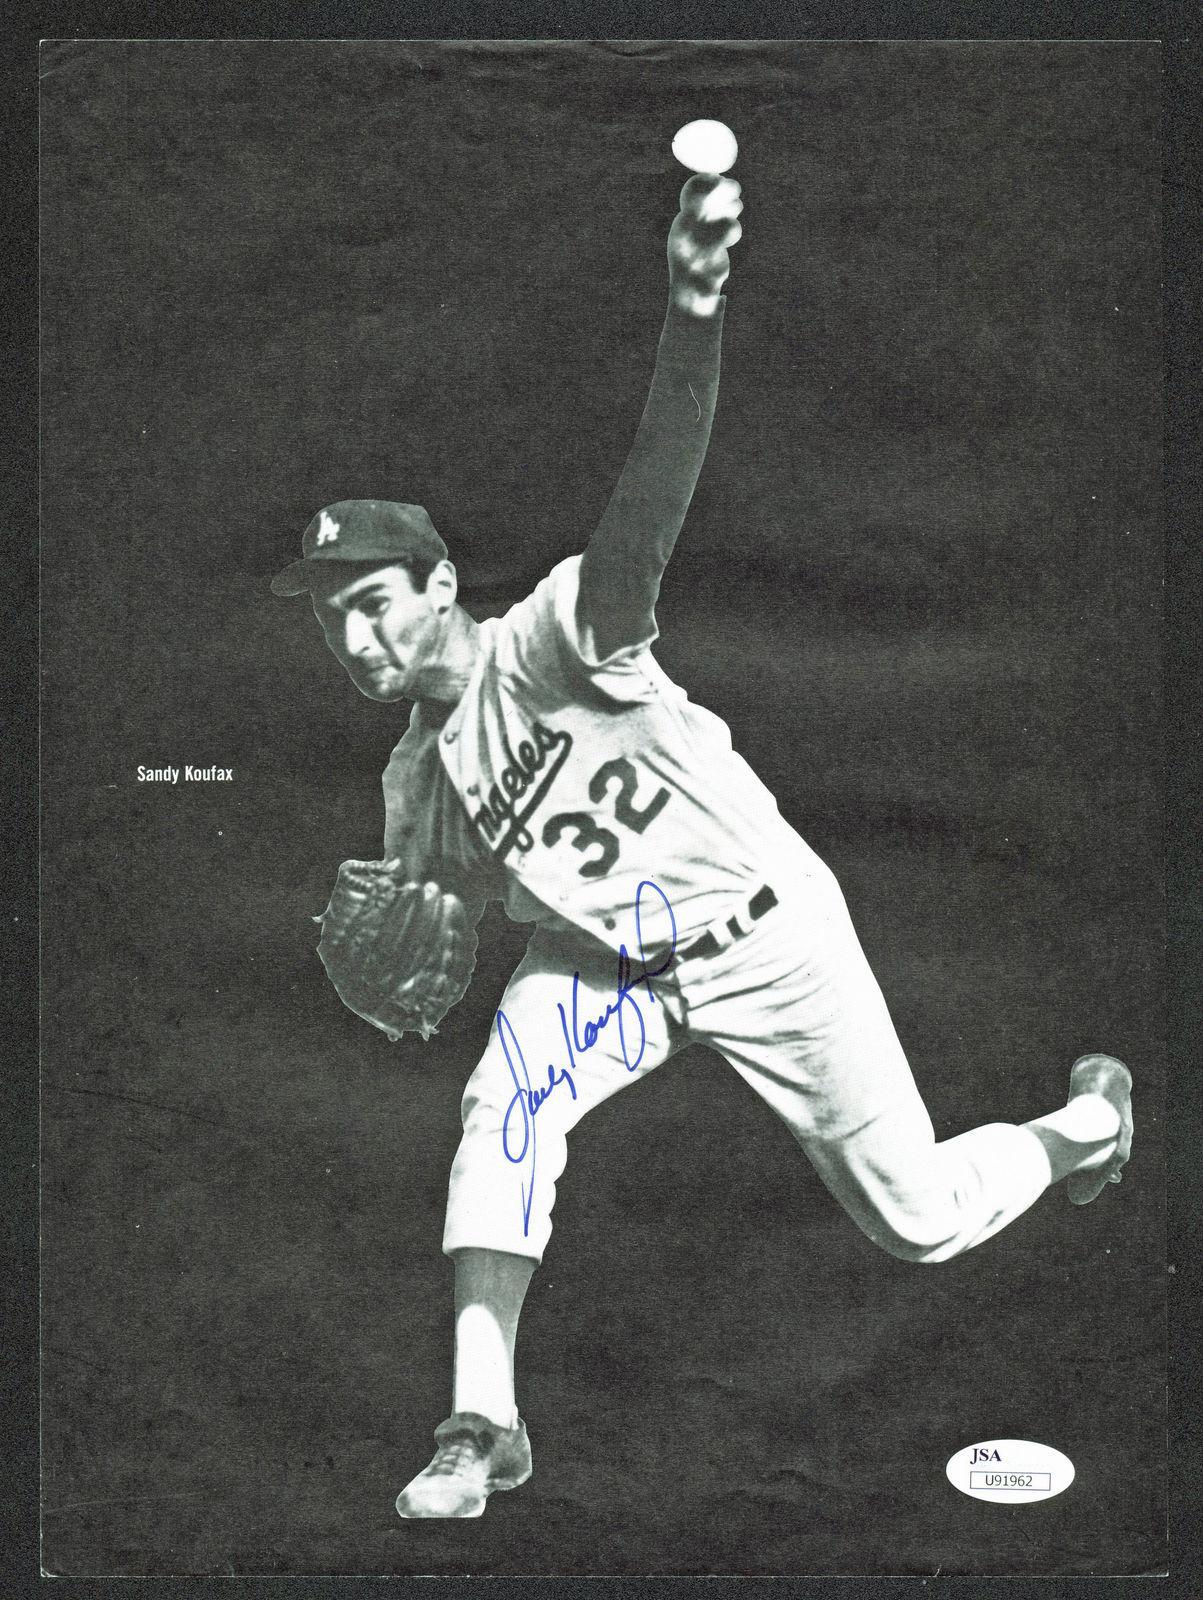 Sandy Koufax & Willie Mays Signed 8.75x12 Magazine Page #U91962 - JSA Certified